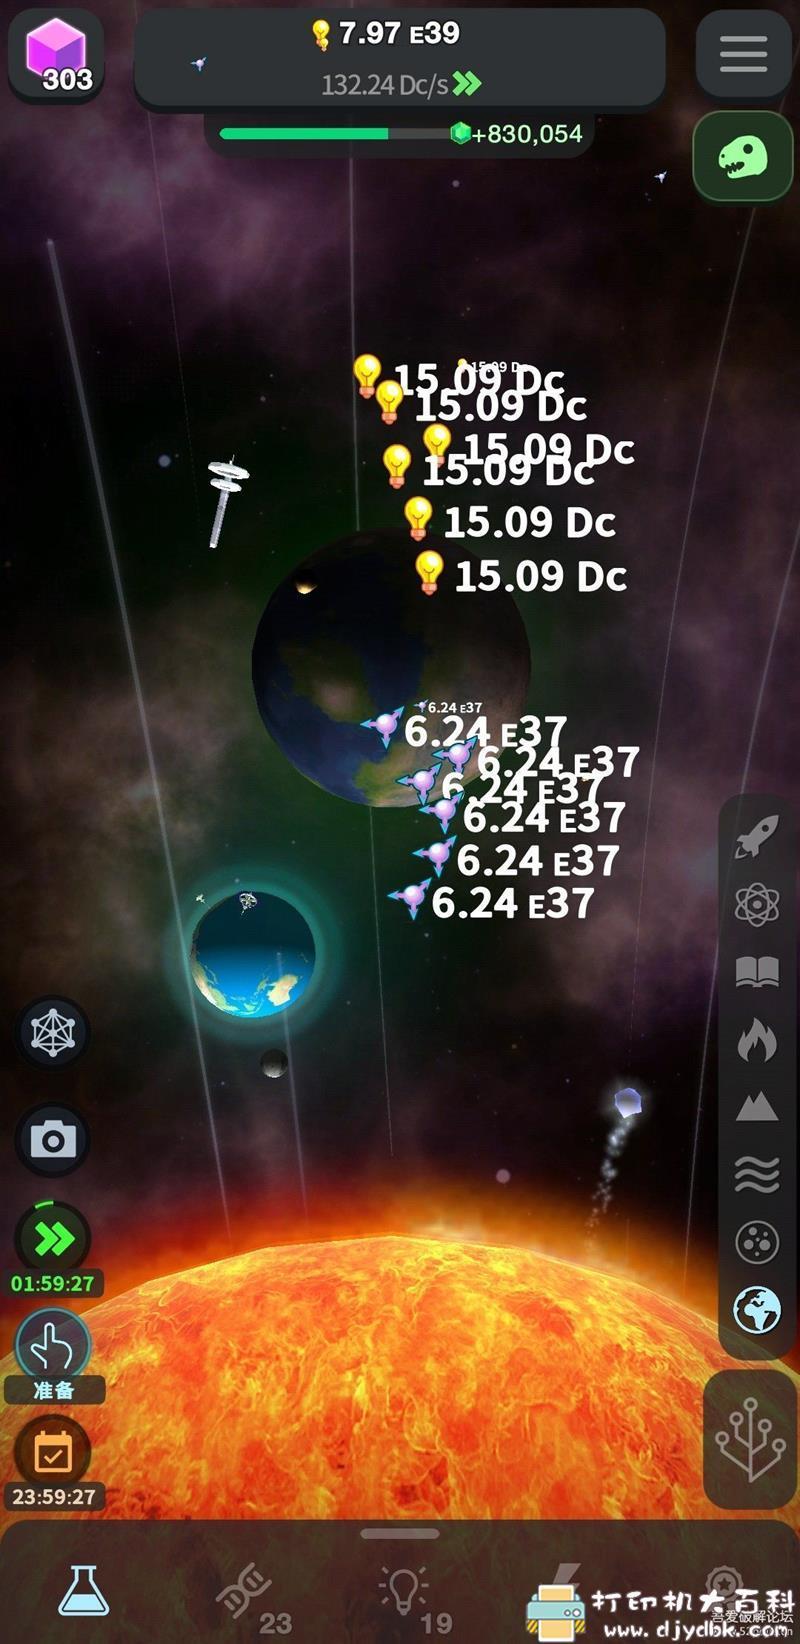 [Android]【惊艳的挂机游戏】从细胞到奇点:进化永无止境(修改版) 配图 No.1